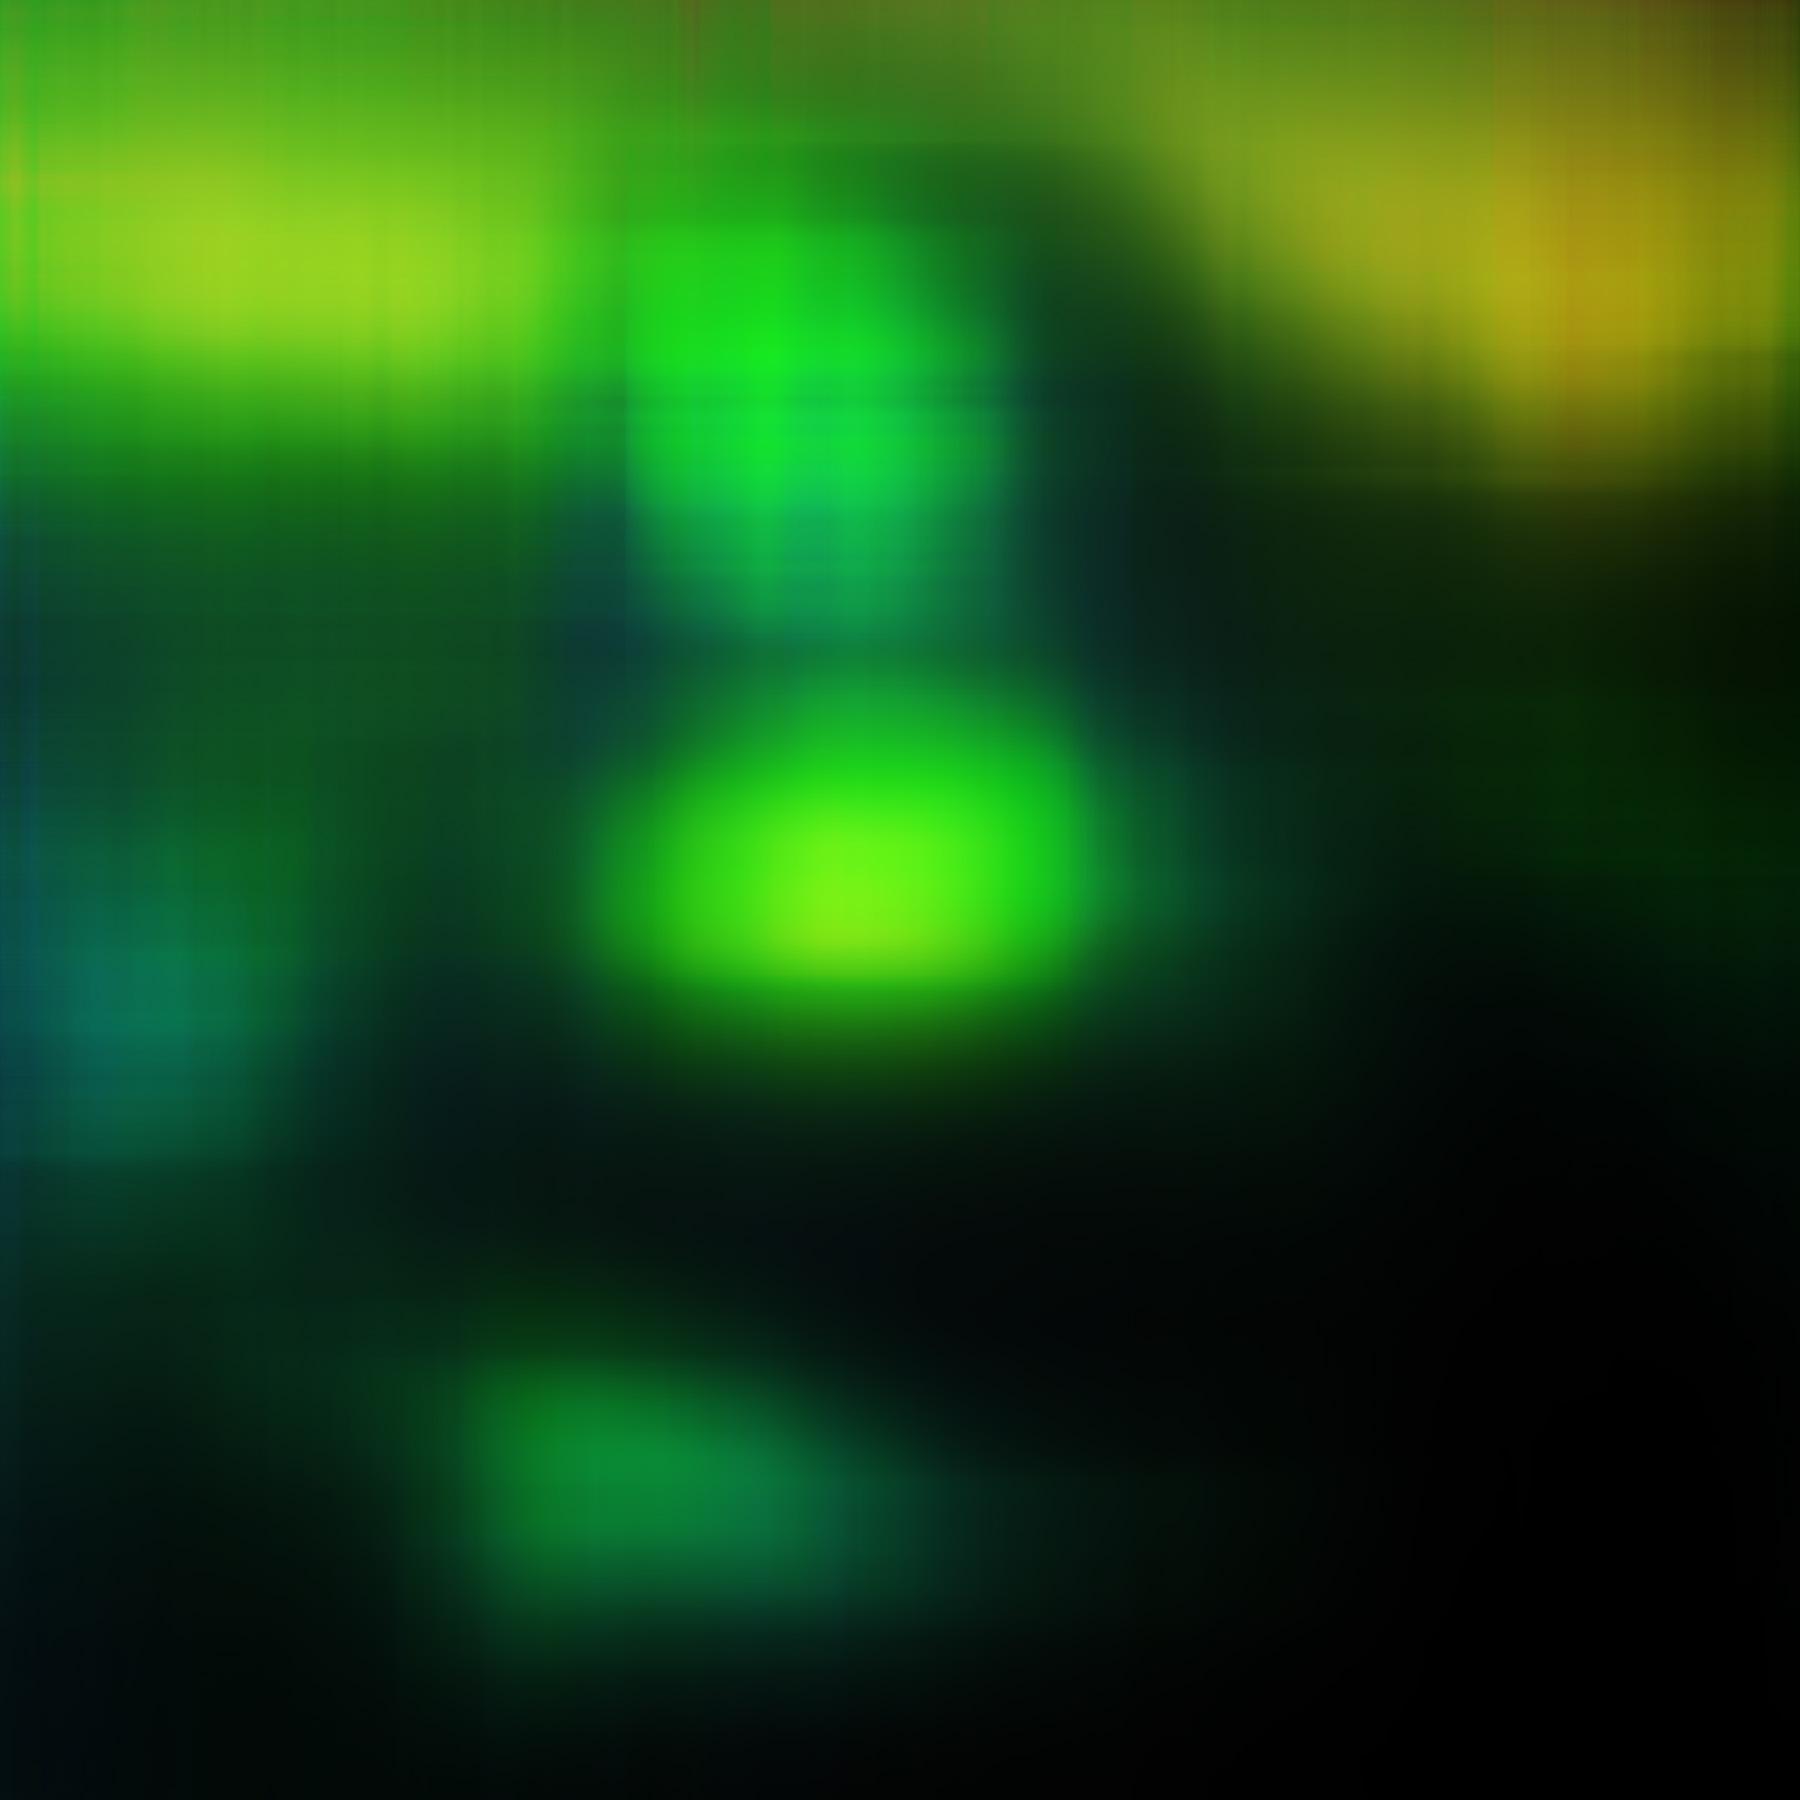 Fat Green Mona